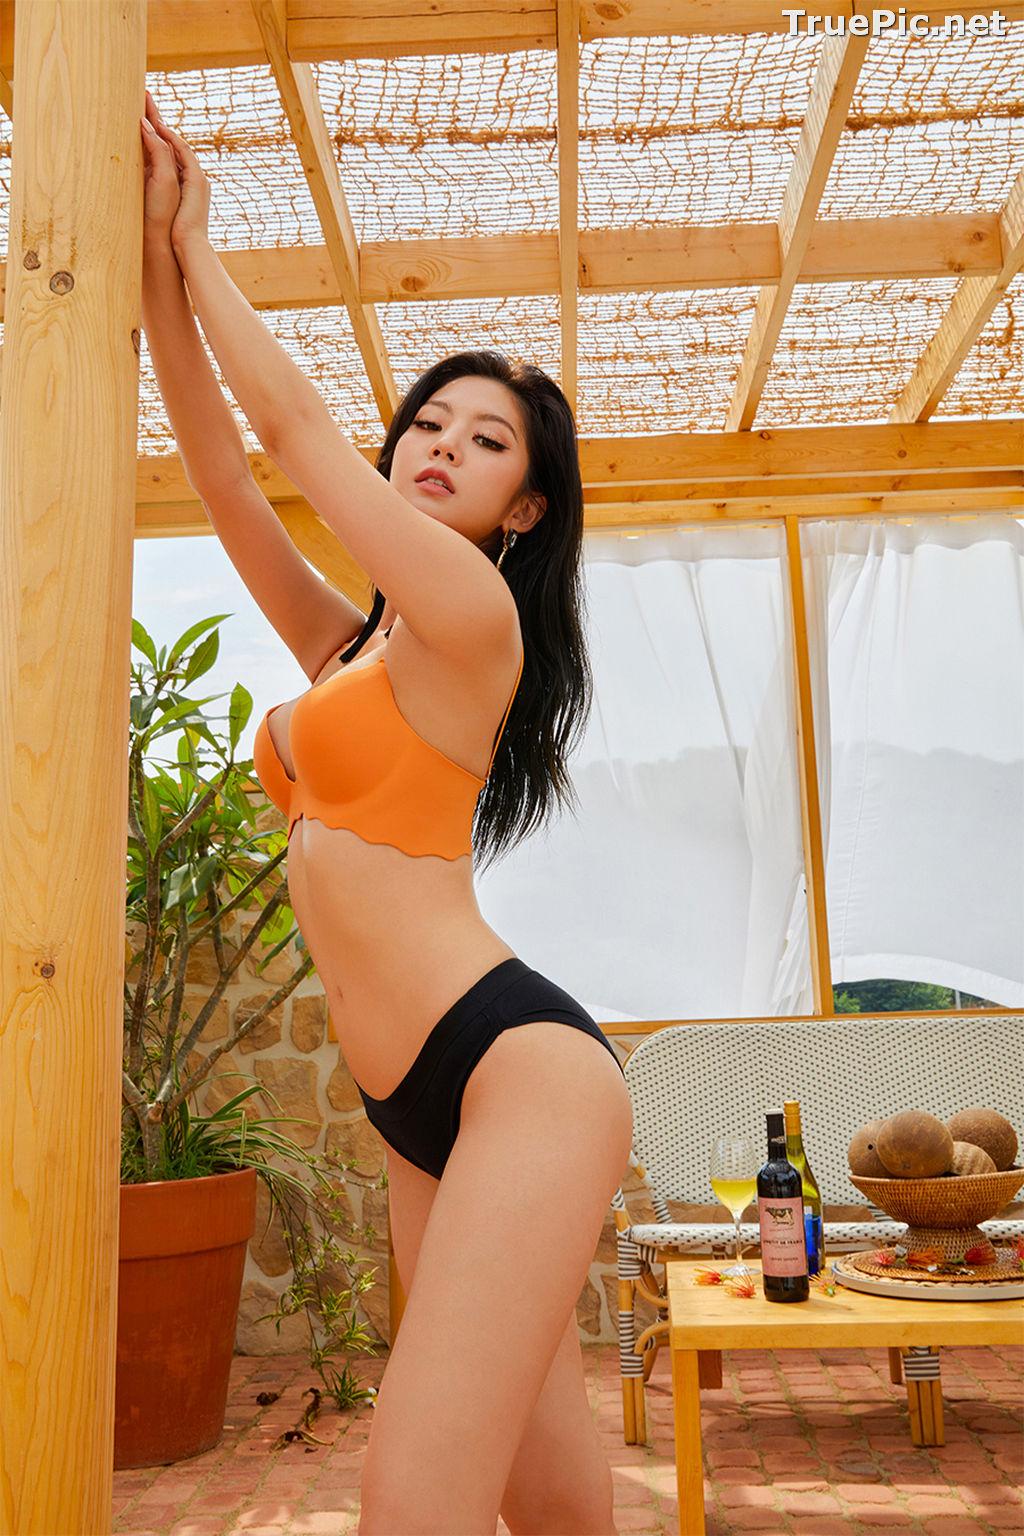 Image Korean Fashion Model – Lee Chae Eun (이채은) – Come On Vincent Lingerie #6 - TruePic.net - Picture-9